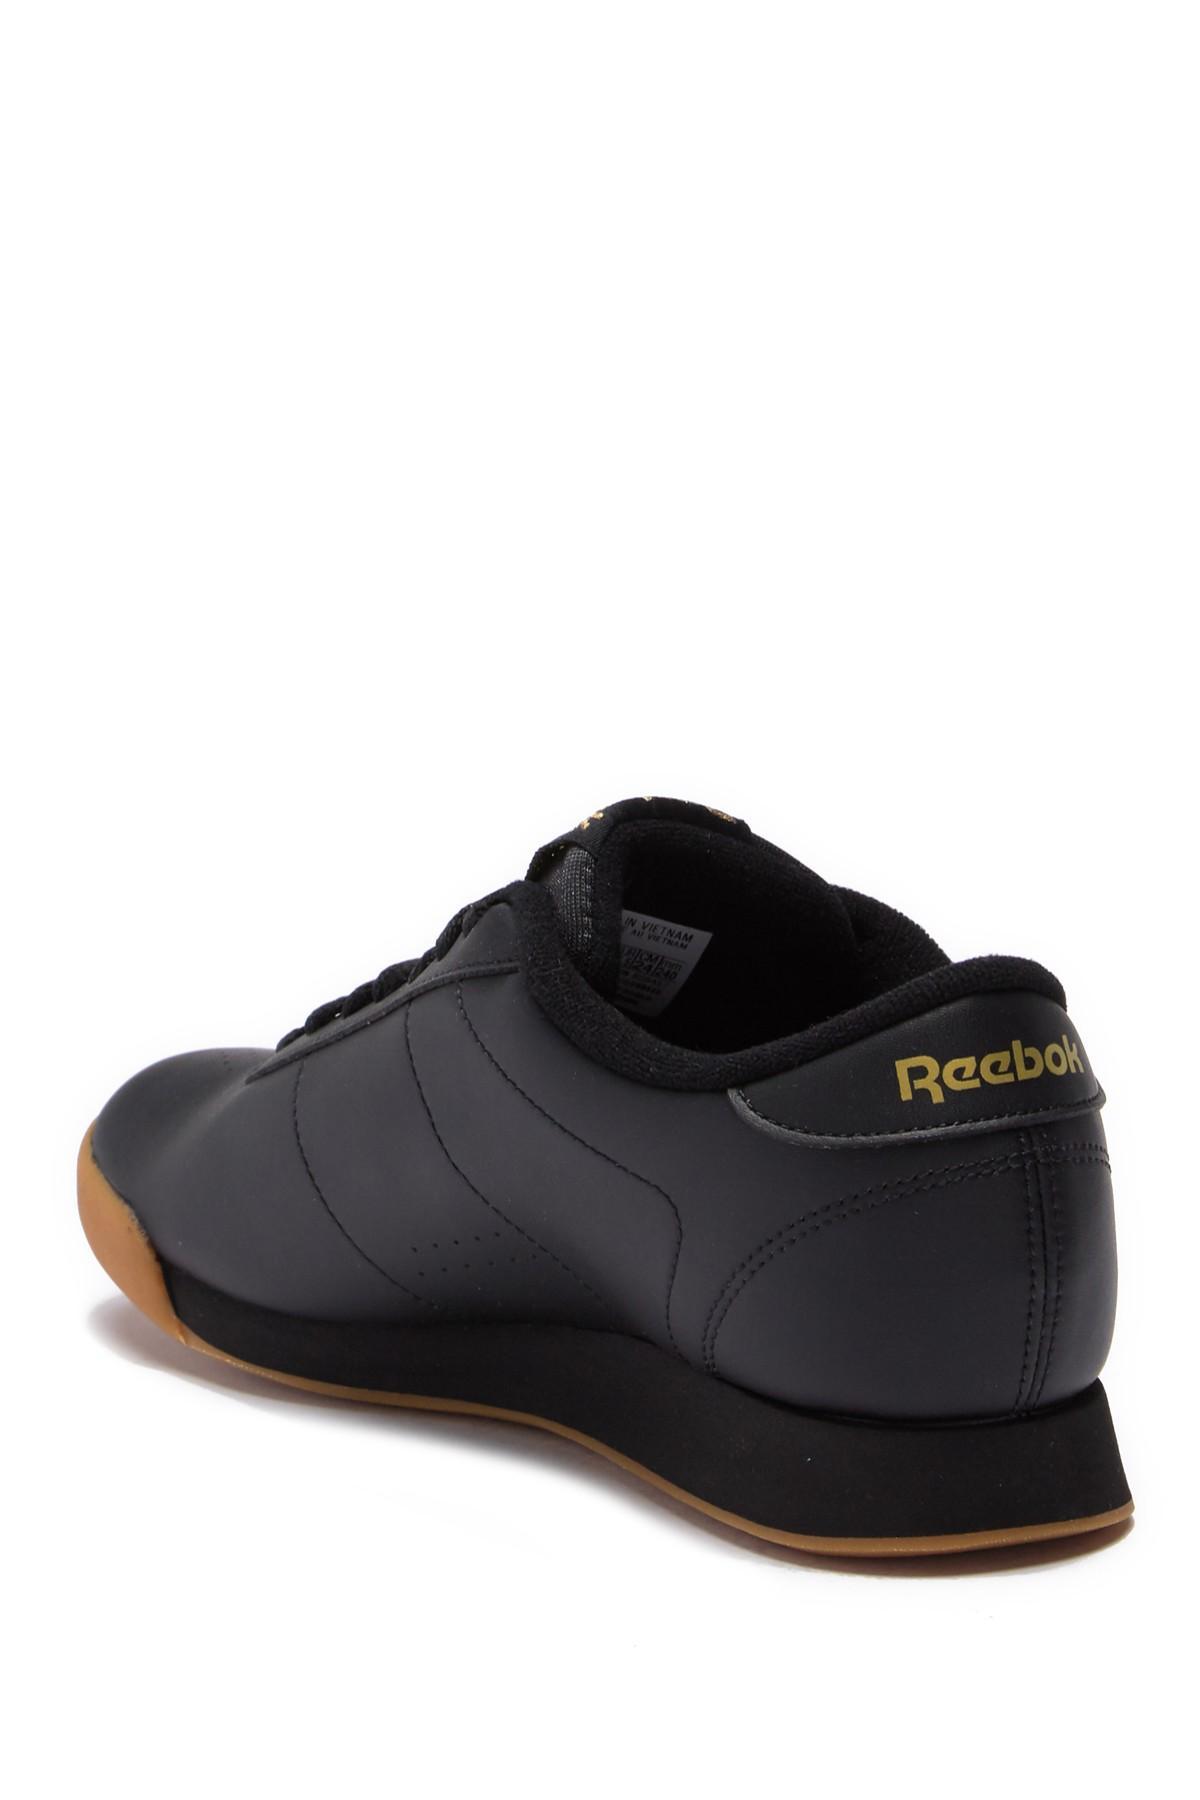 ebf6de44183 Reebok - Black Princess Sneaker - Lyst. View fullscreen